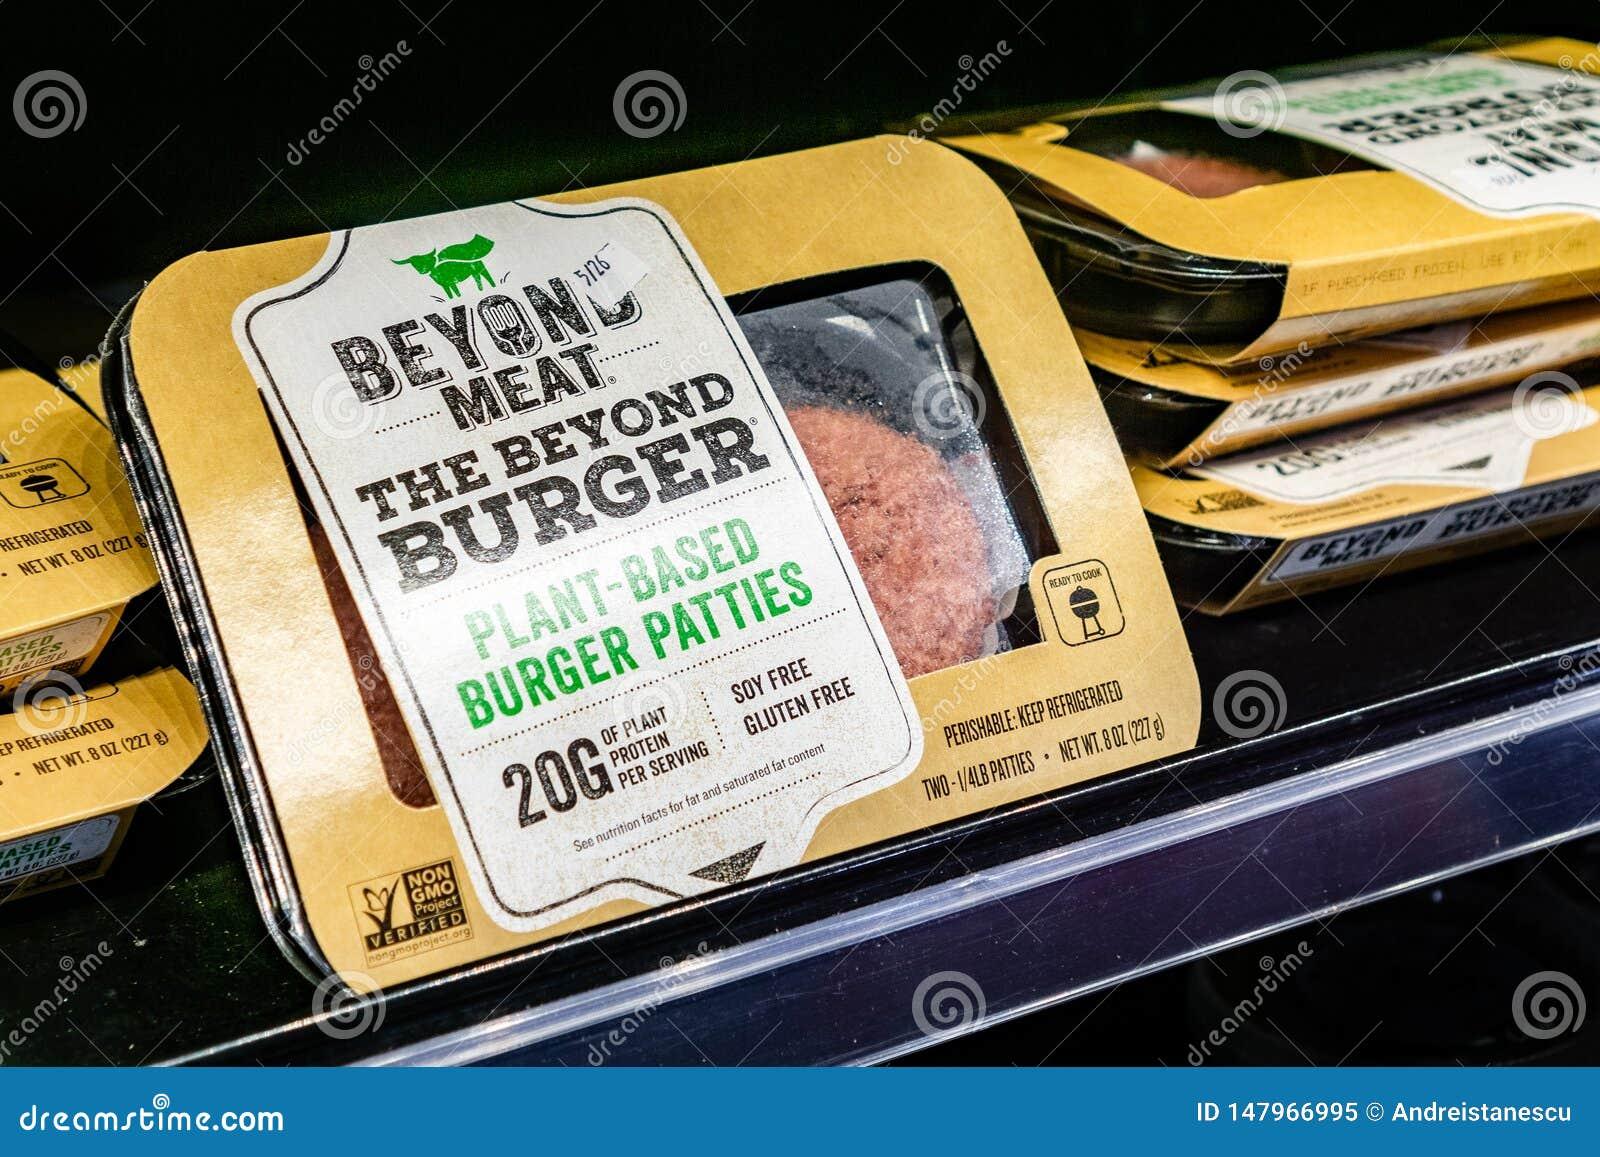 17 mai 2019 Cupertino/CA/Etats-Unis - au delà des paquets d hamburger de viande disponibles pour l achat dans un magasin dans la